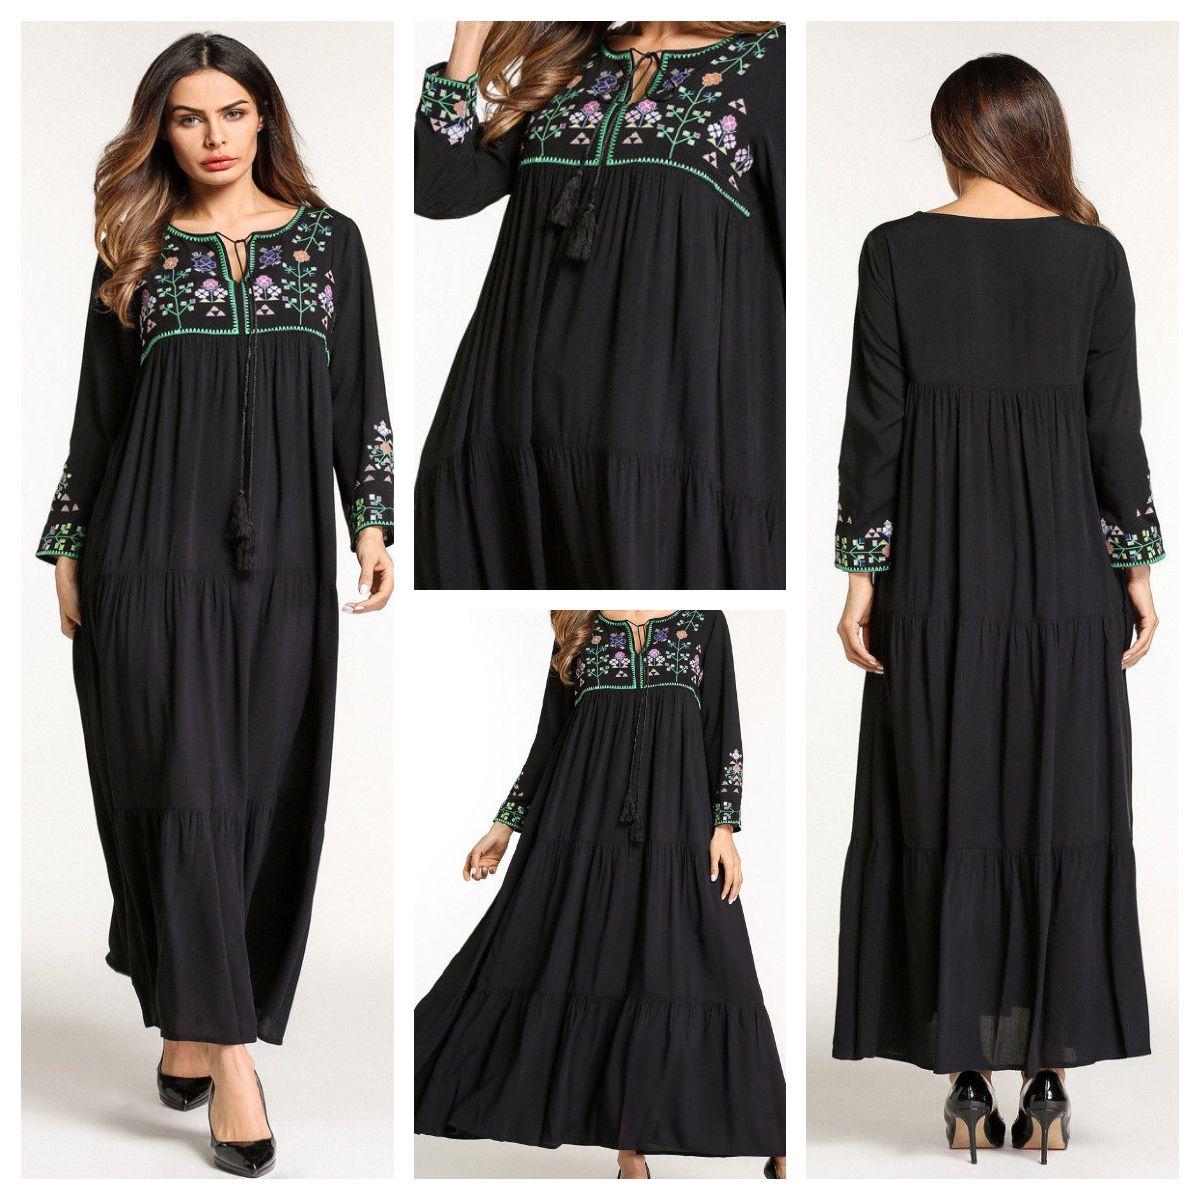 Loose maxi dress black viscose material summer dress abaya